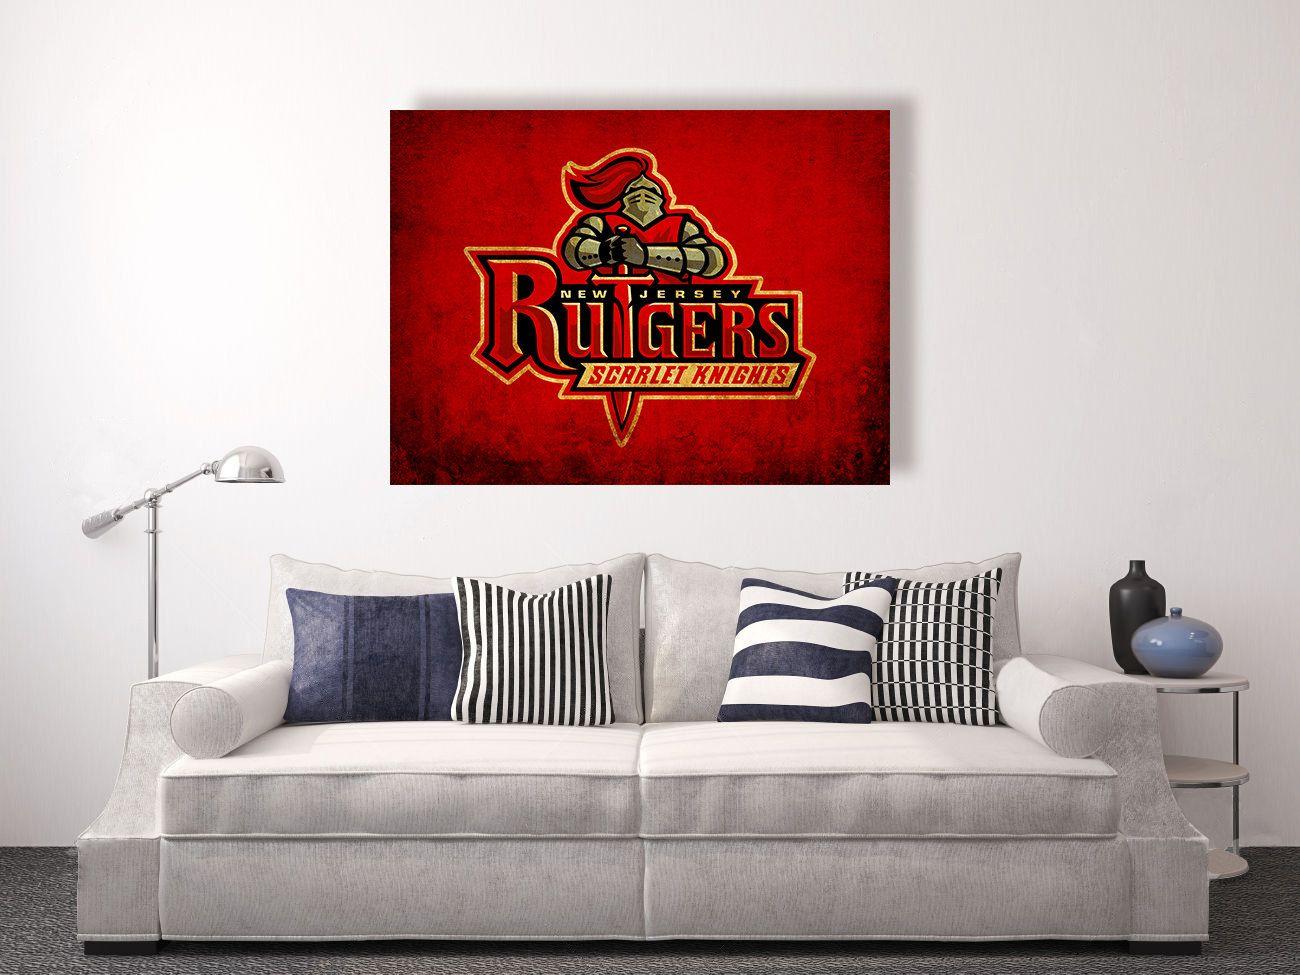 Rutgers University Rutgers Scarlet Knights Vintage Style Etsy Vintage Office Decor Apartment Decor Decor